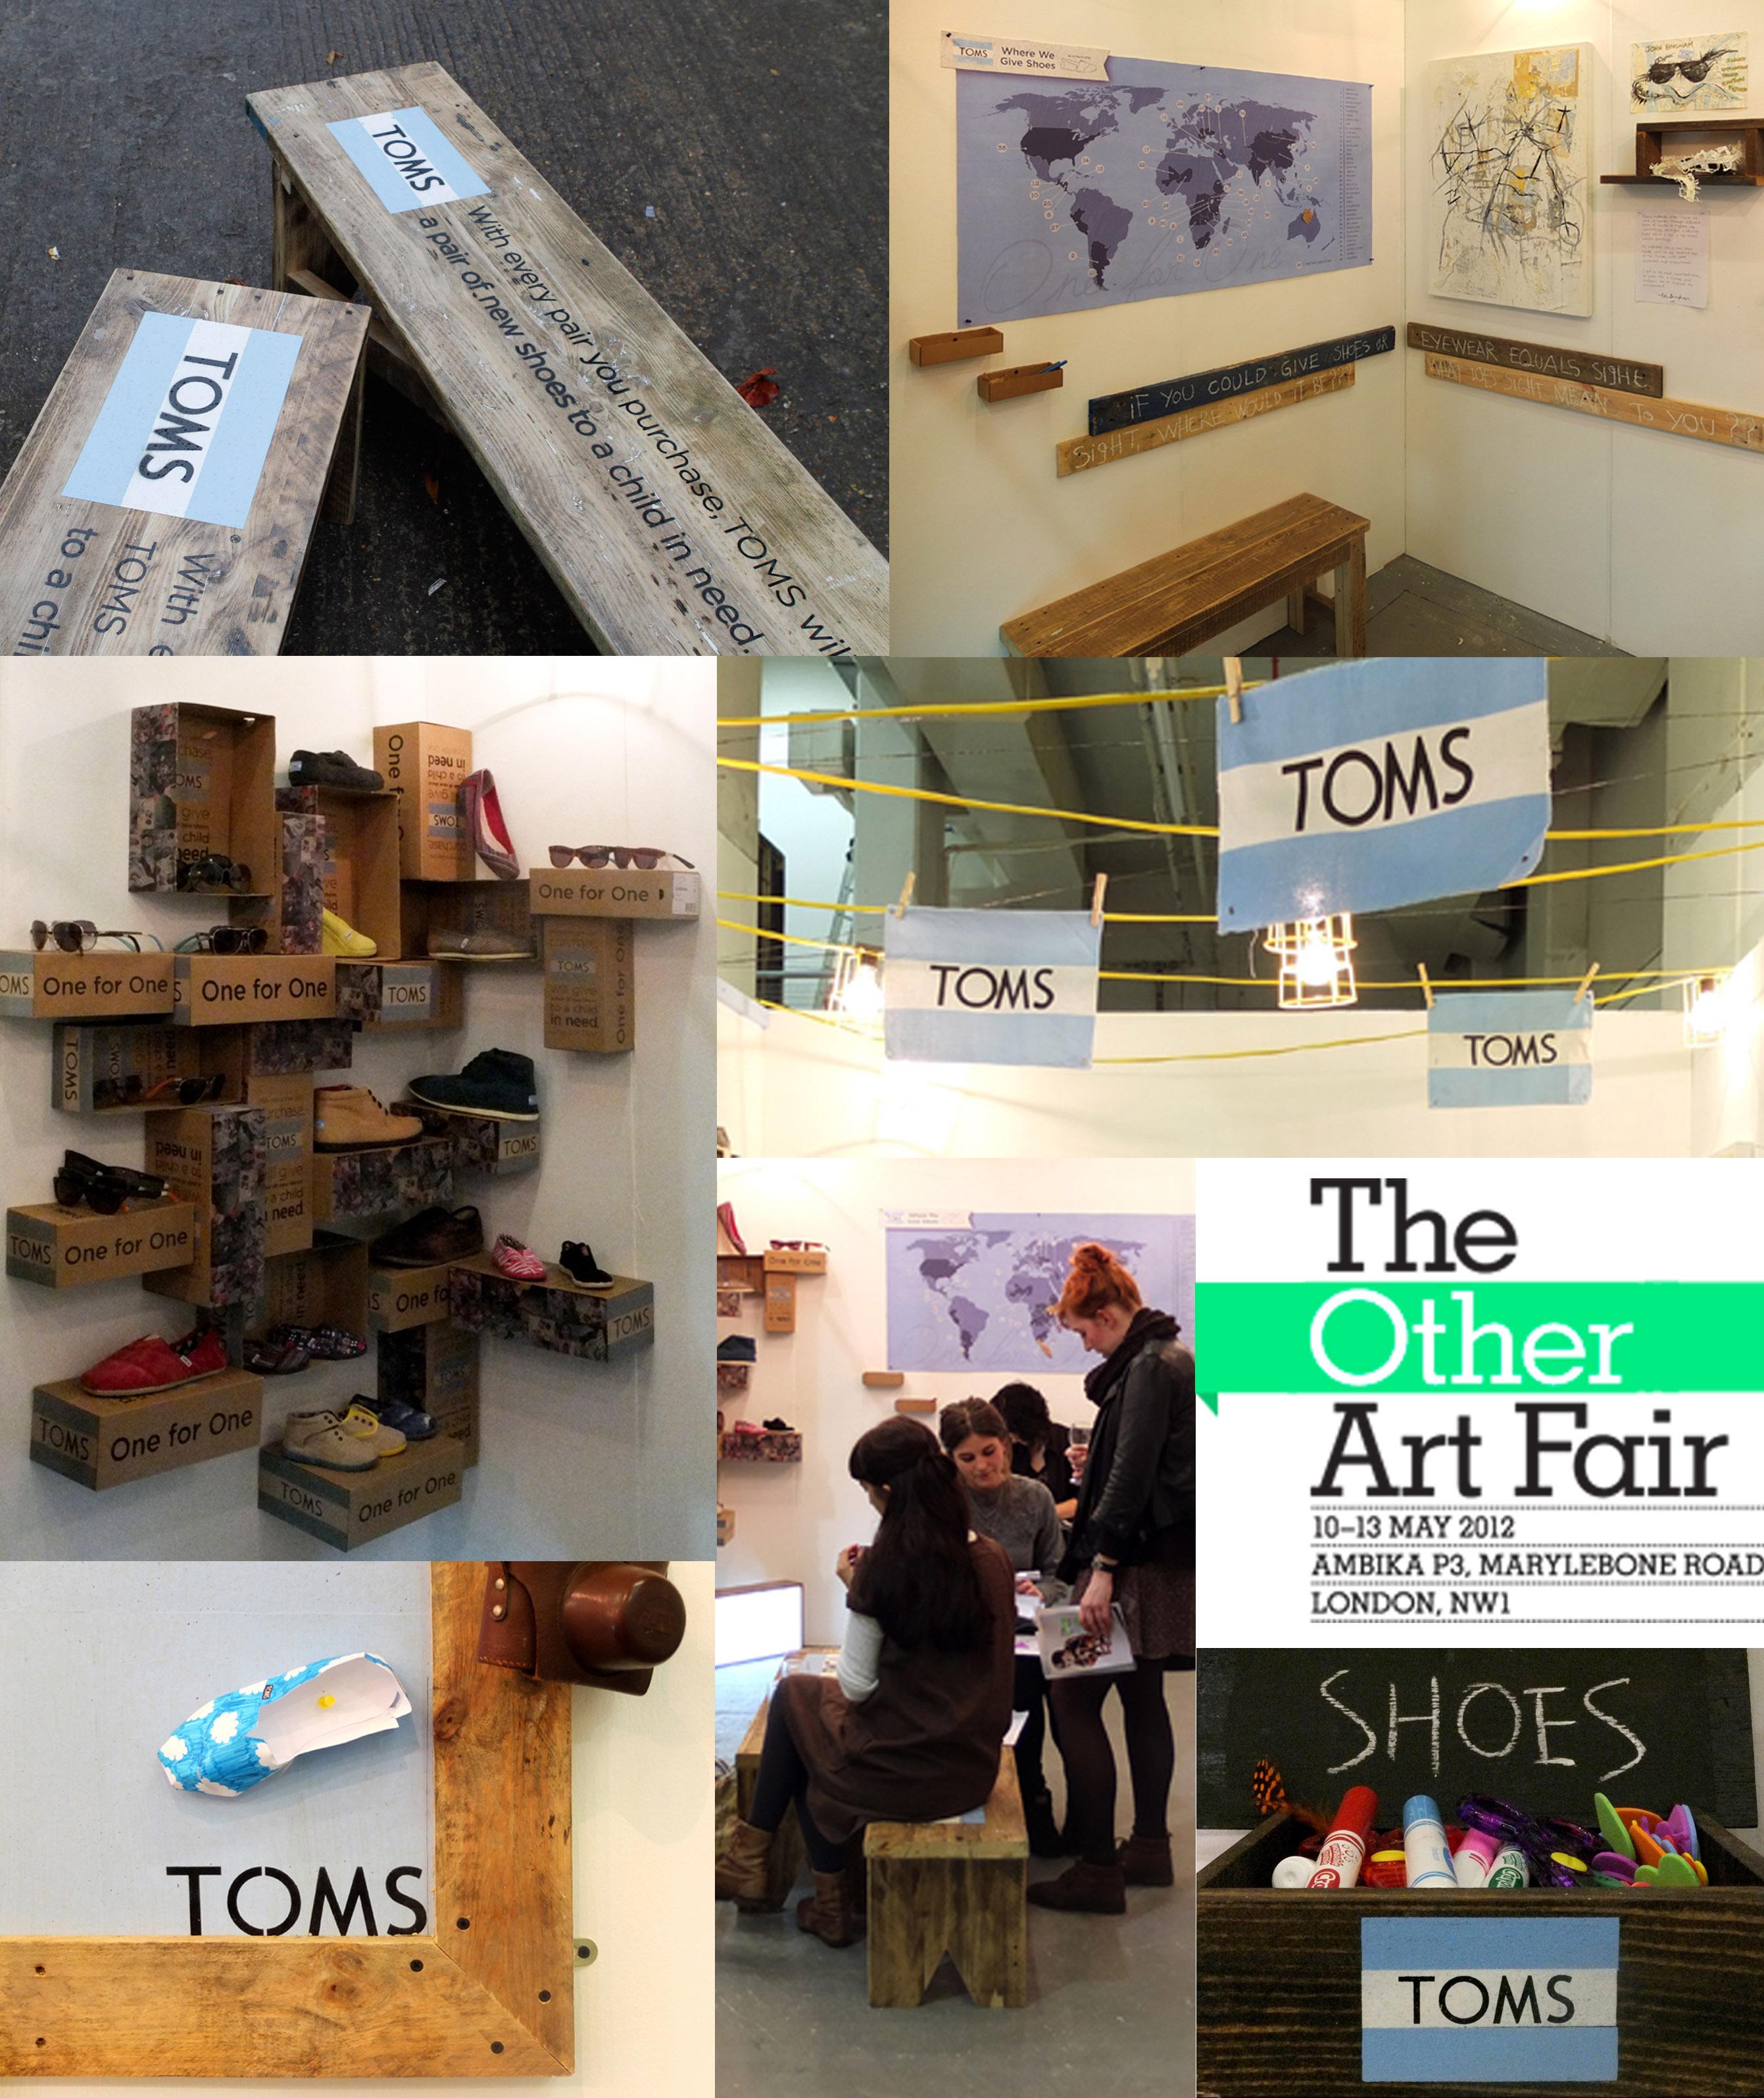 Exhibition Stand Shoes : Exhibition stands in düsseldorf